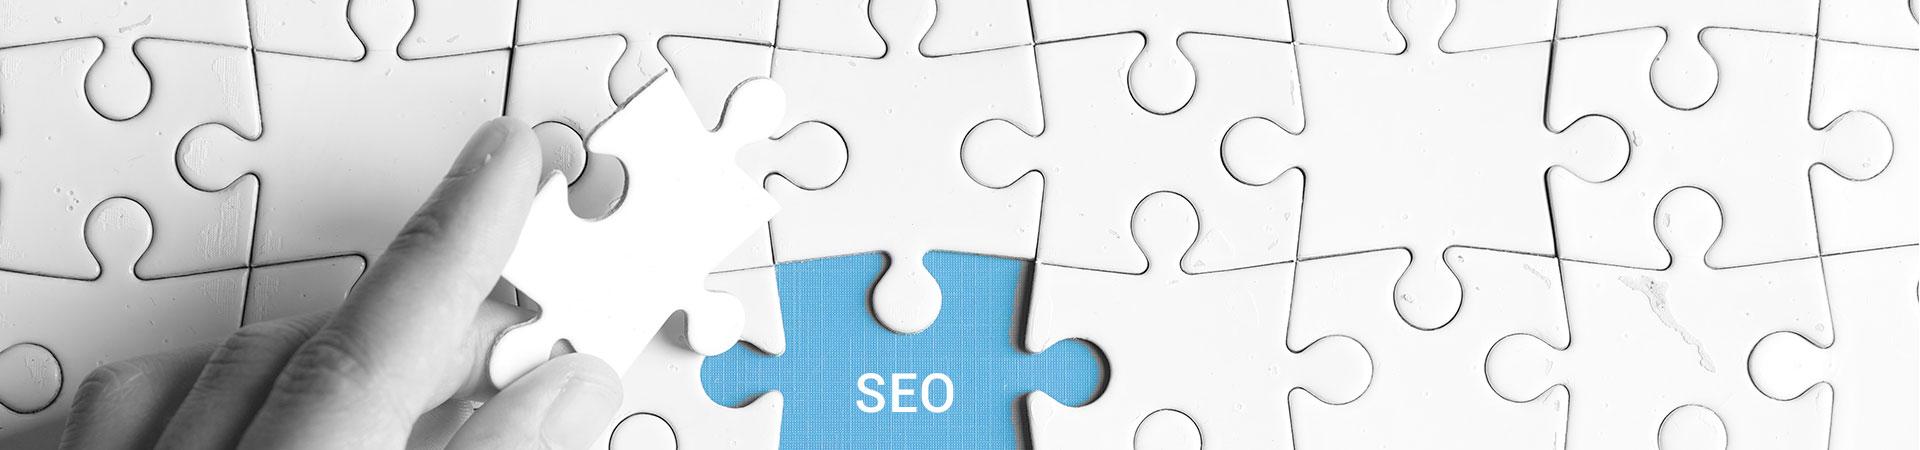 Search Engine Optimization (SEO) & Marketing